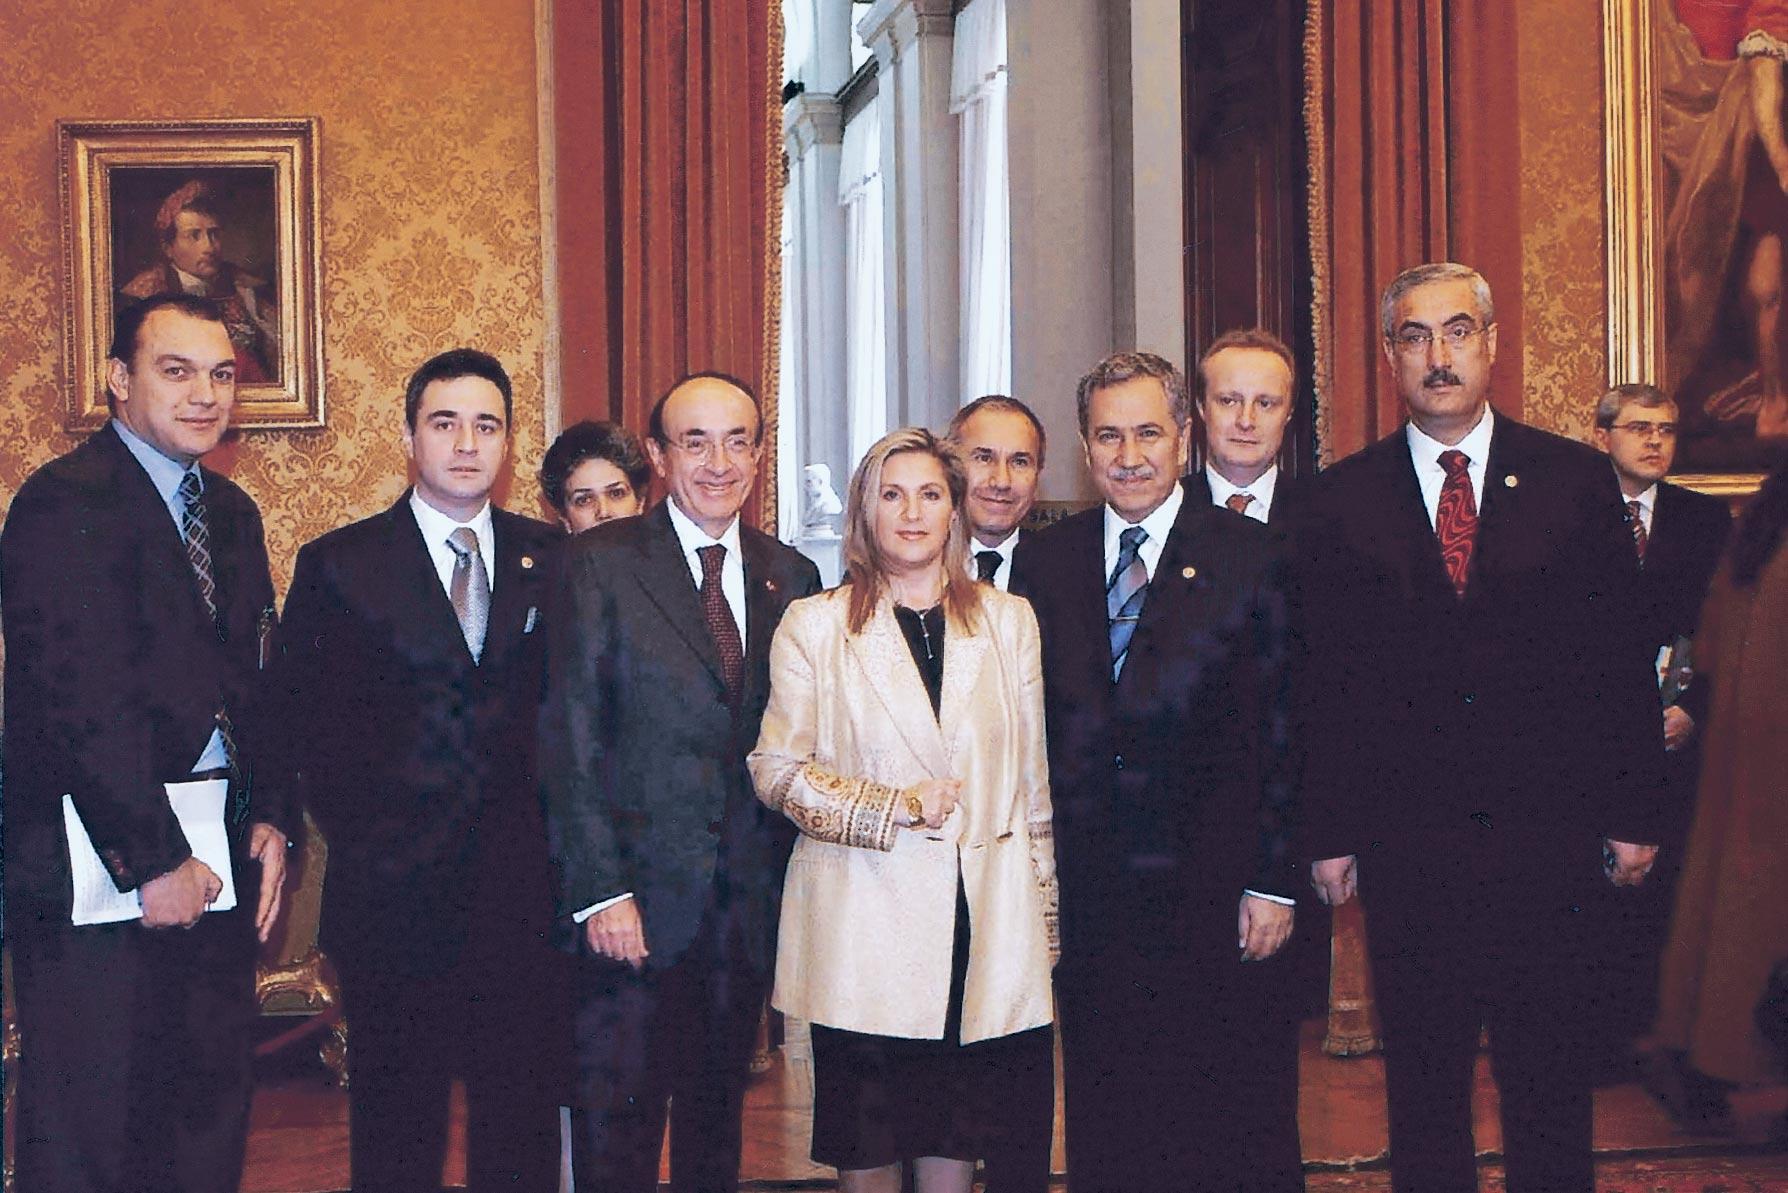 Roma, Camera dei Deputati, 26 gennaio 2005 - Presidente Parlamento turco Bulent Arinc e Ambasciatore Carlo Marsili